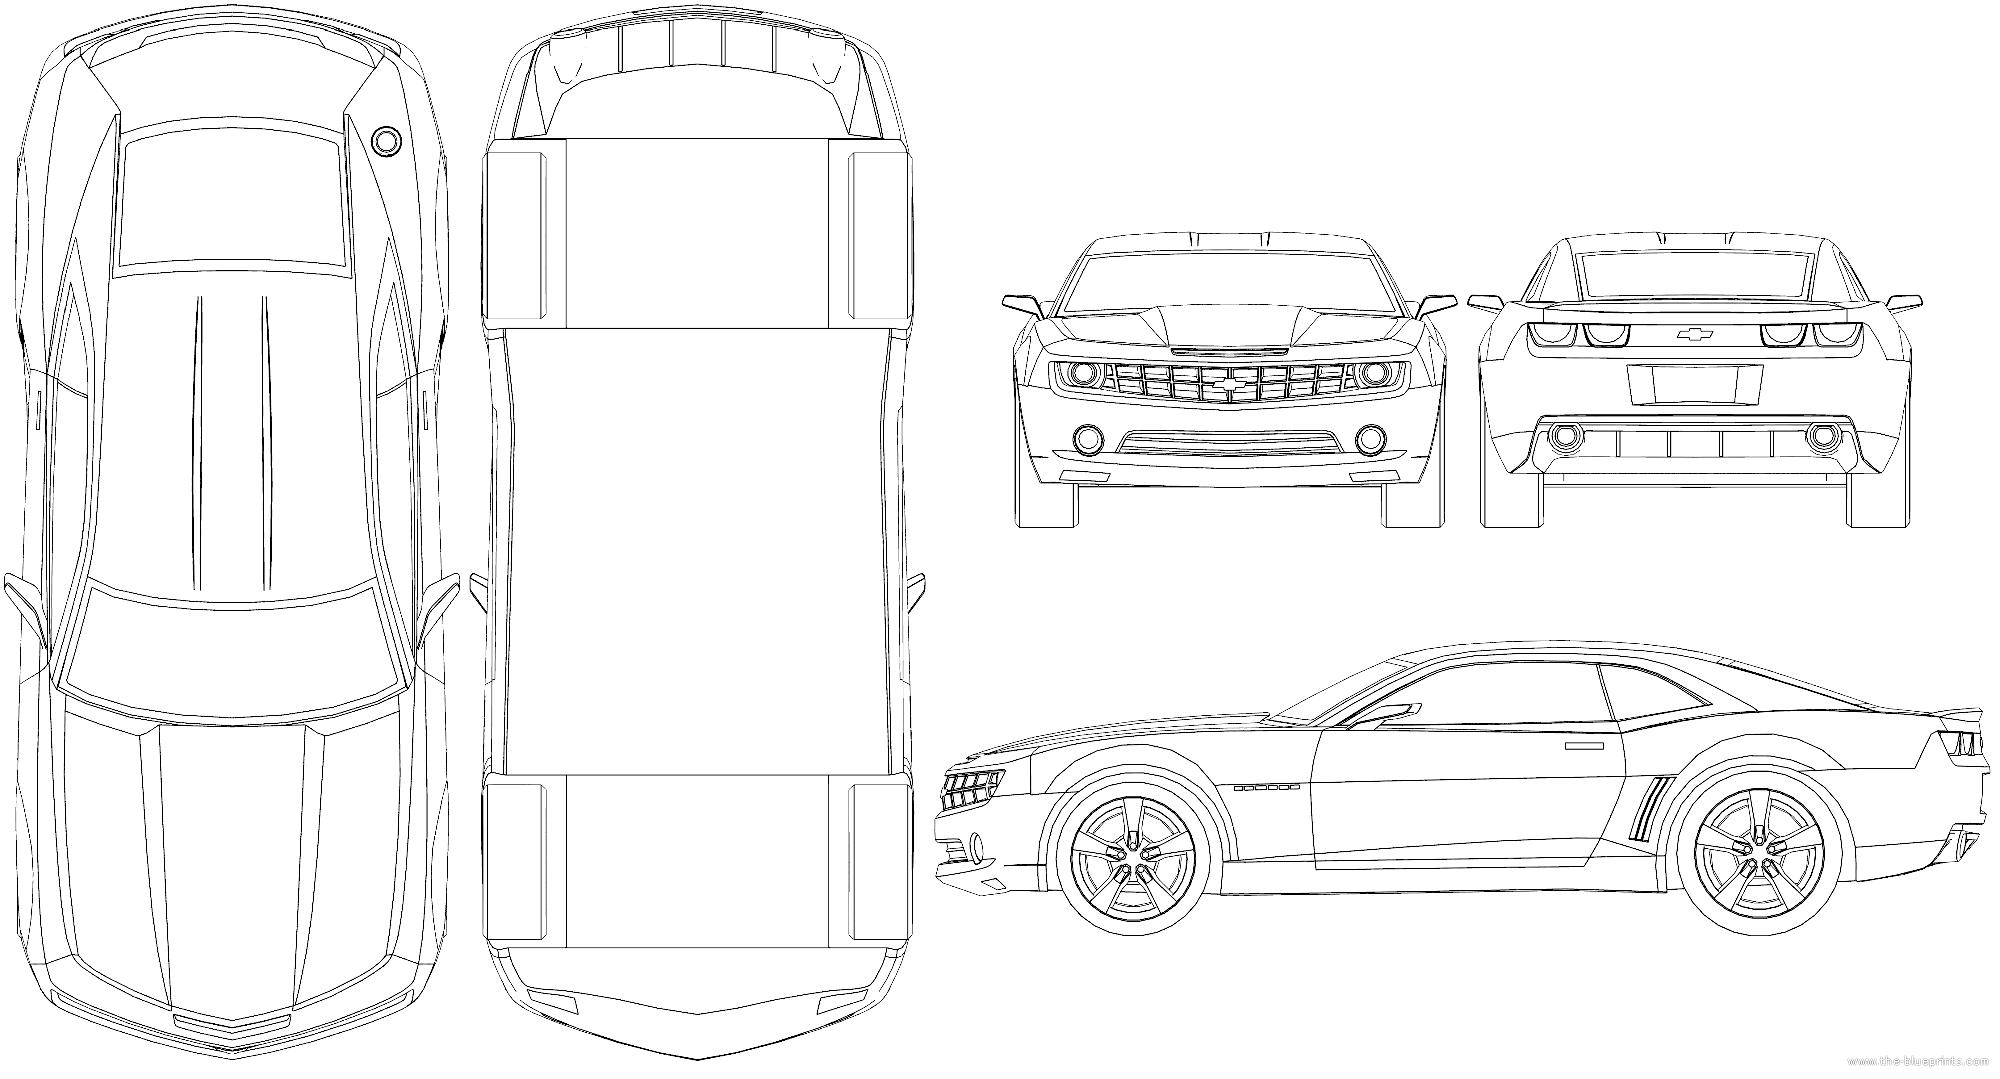 Blueprints Gt Cars Gt Chevrolet Gt Chevrolet Camaro